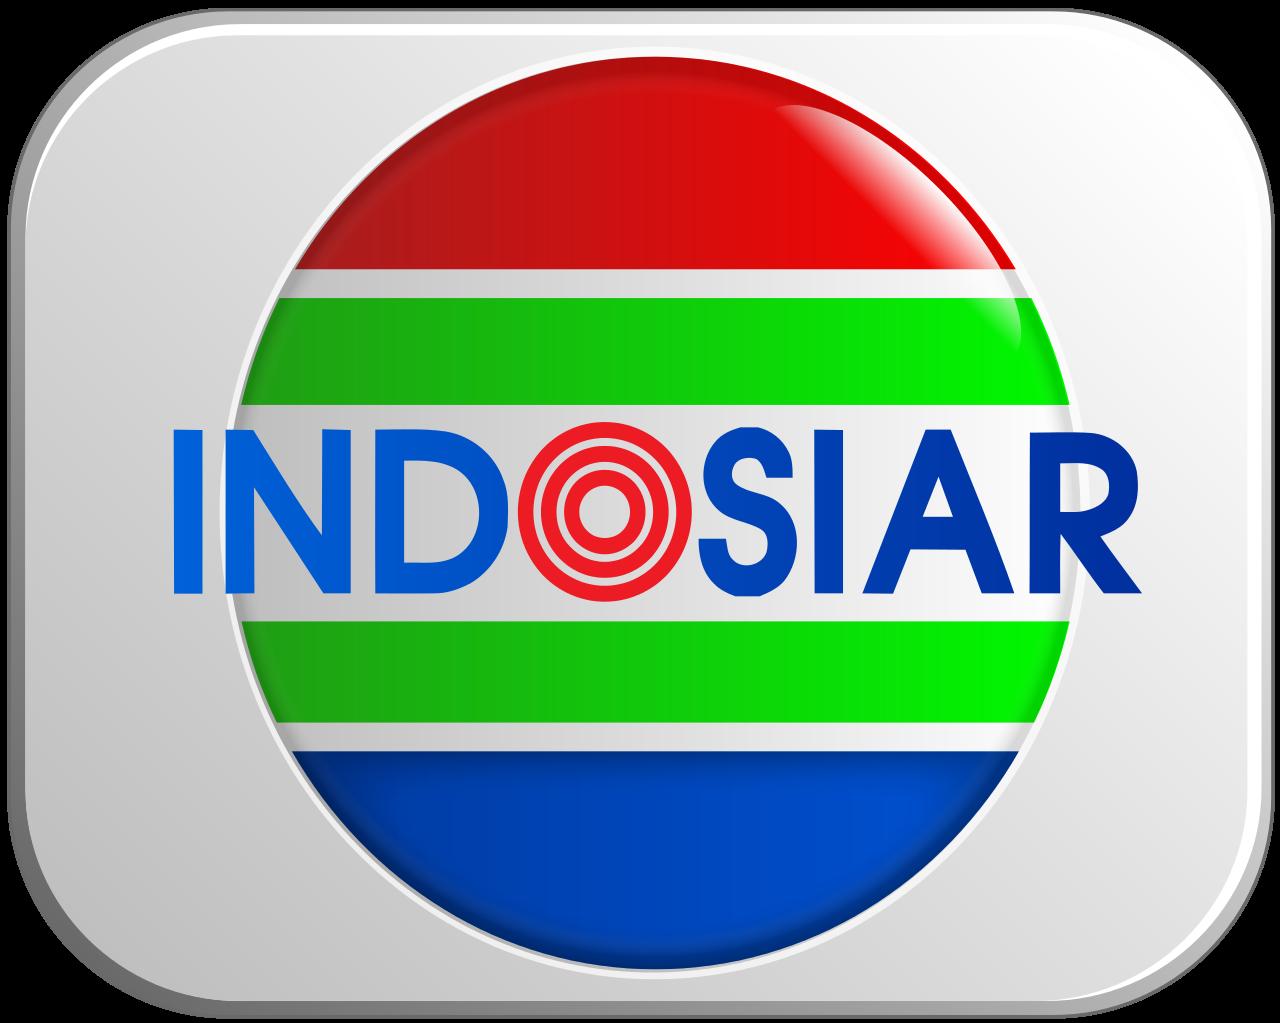 gambar logo stasiun televisi indosiar